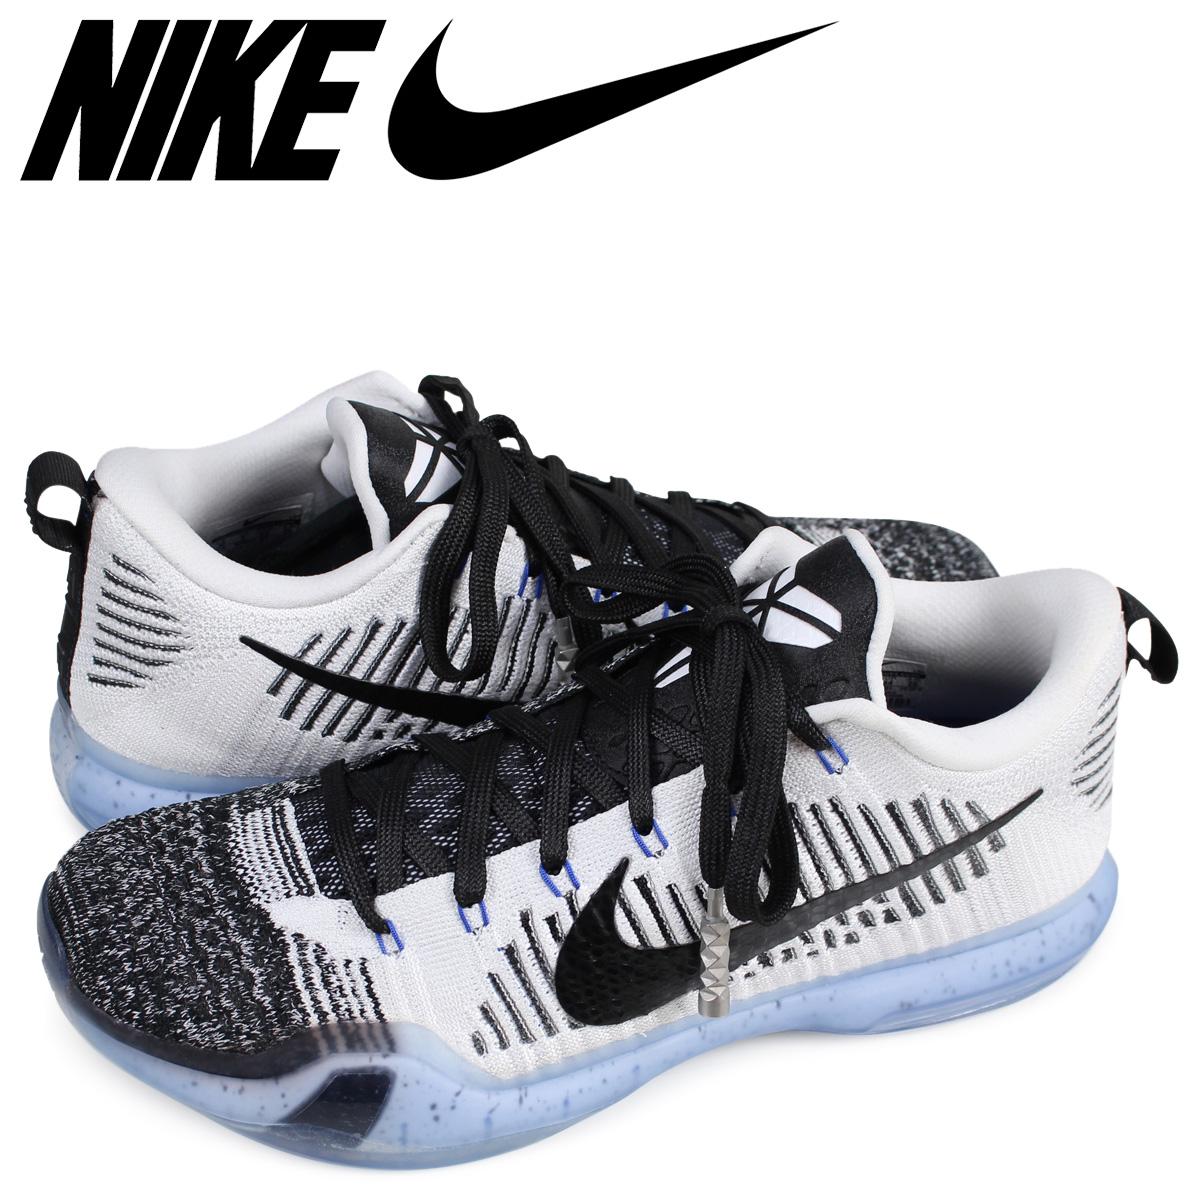 1717f54e5727 ALLSPORTS  NIKE KOBE 10 ELITE LOW PREMIUM HTM Nike Corby 10 sneakers ...